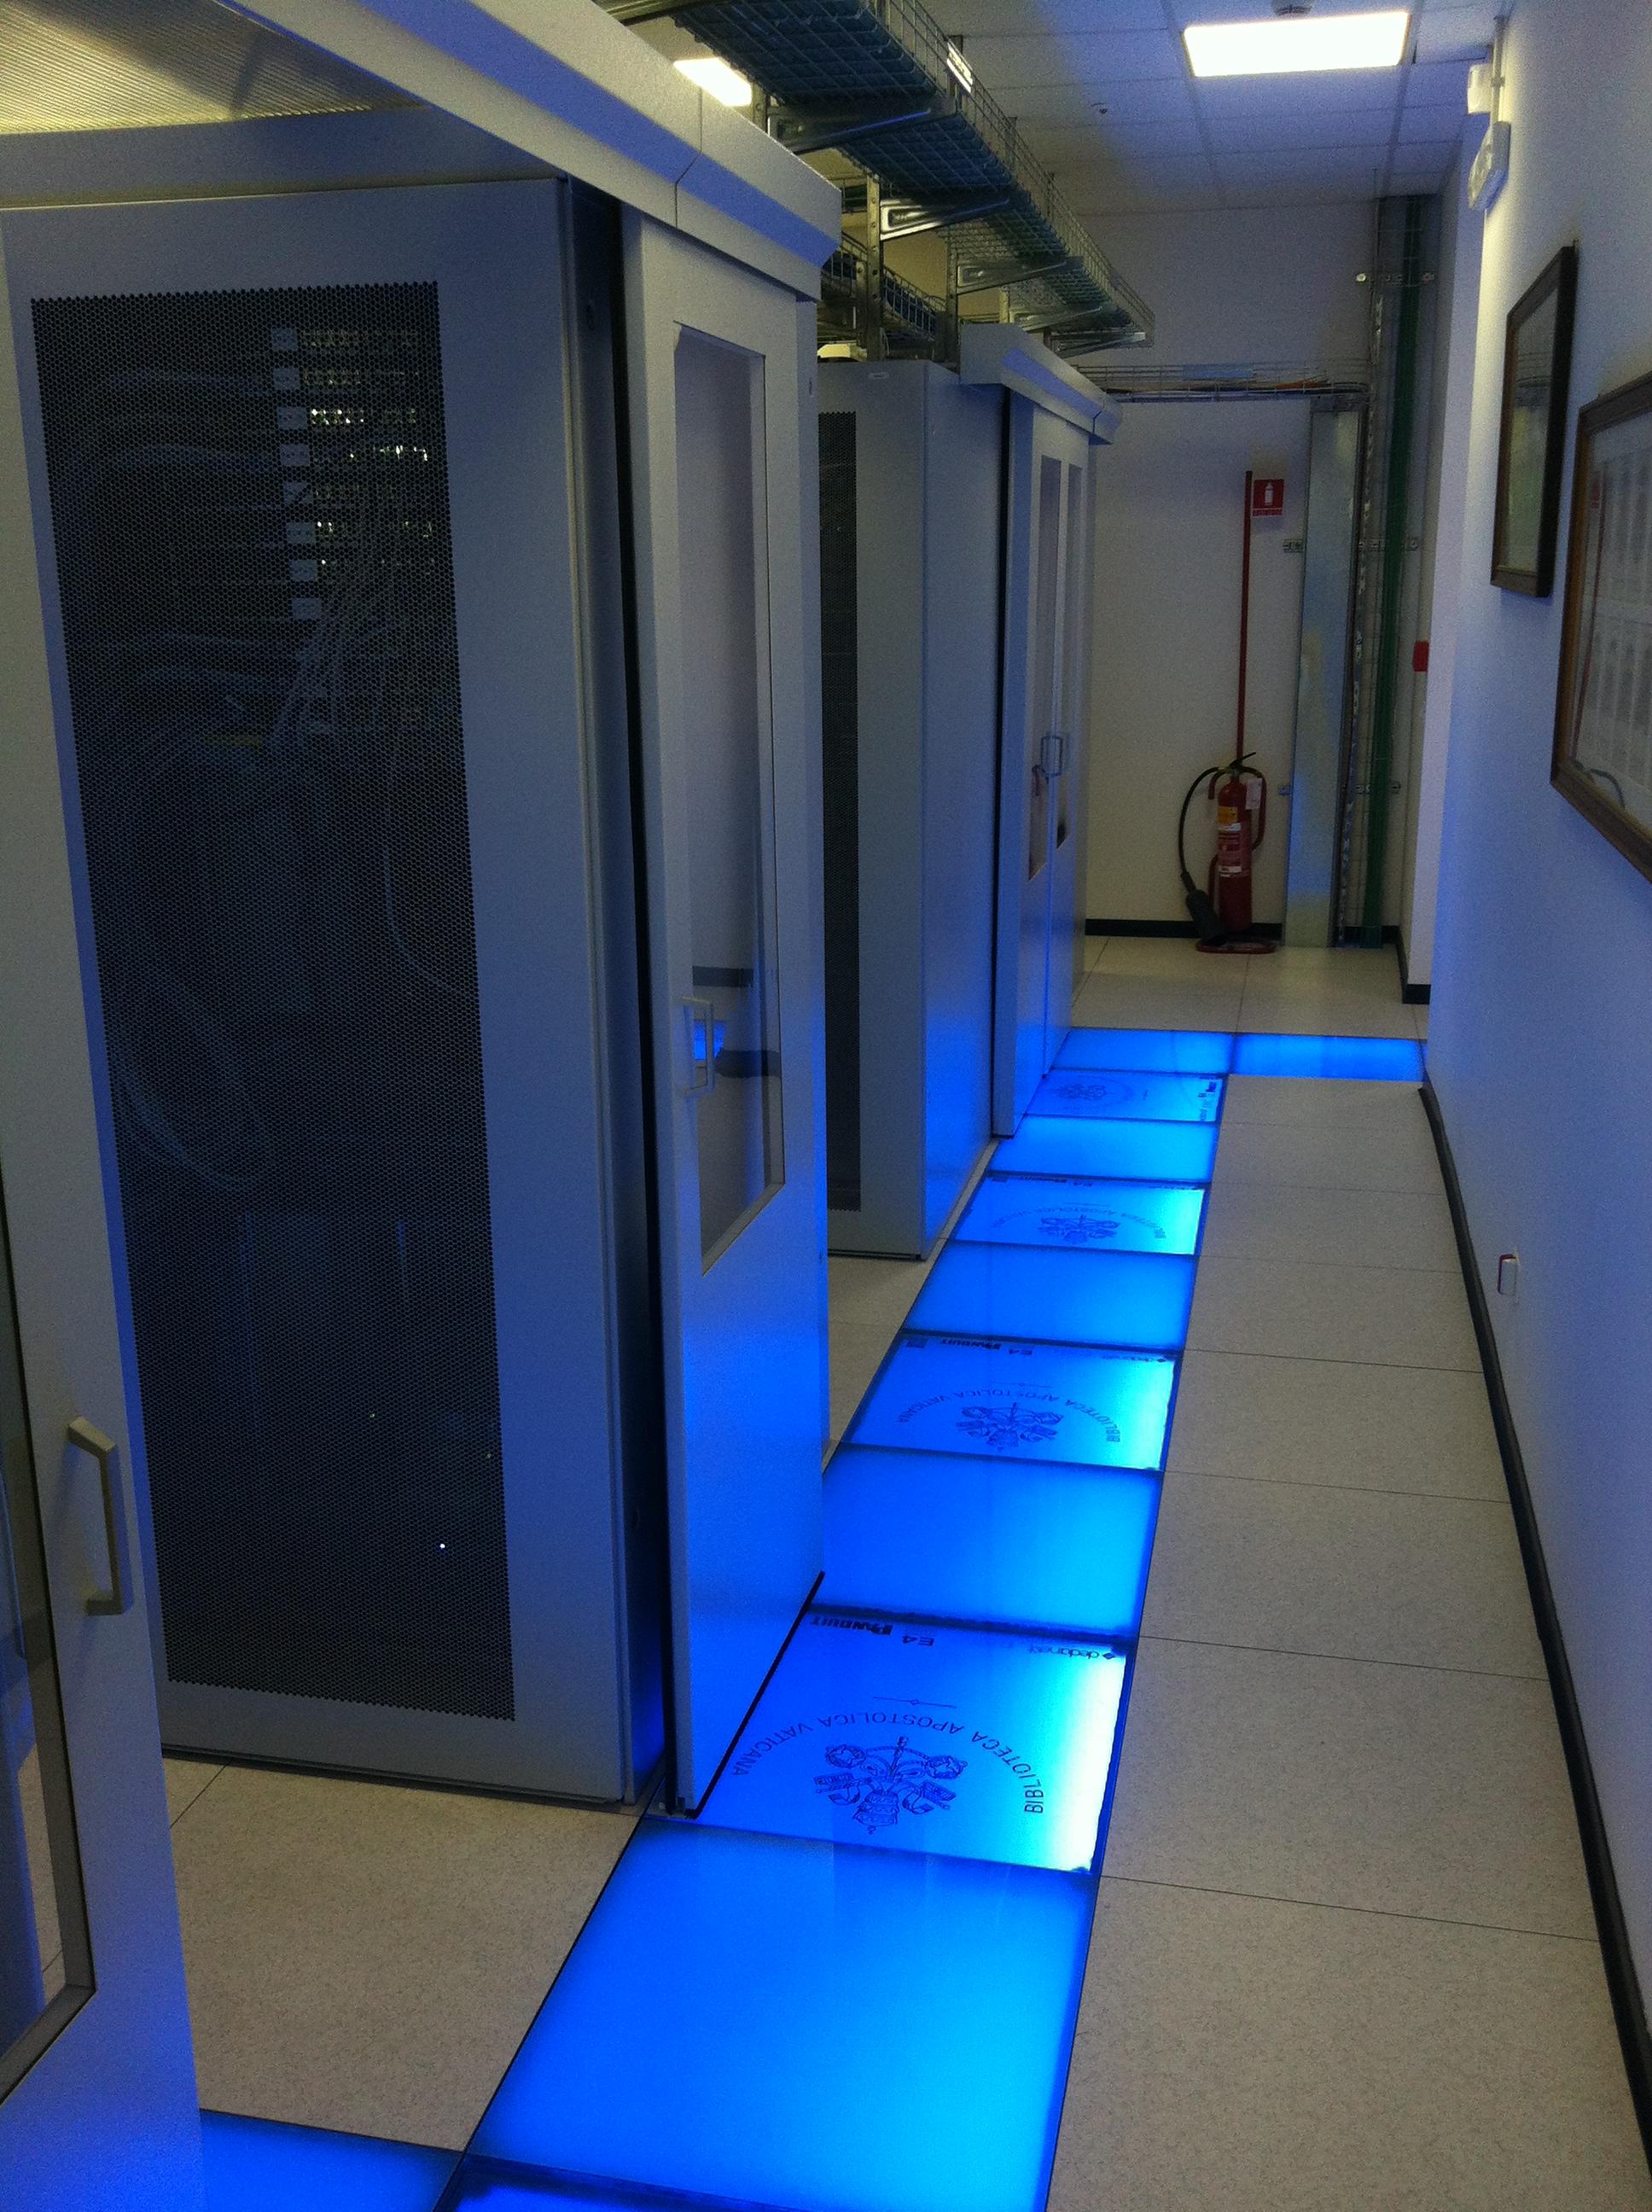 datacenter 7 Nesite entra nel Data Center della Biblioteca Vaticana